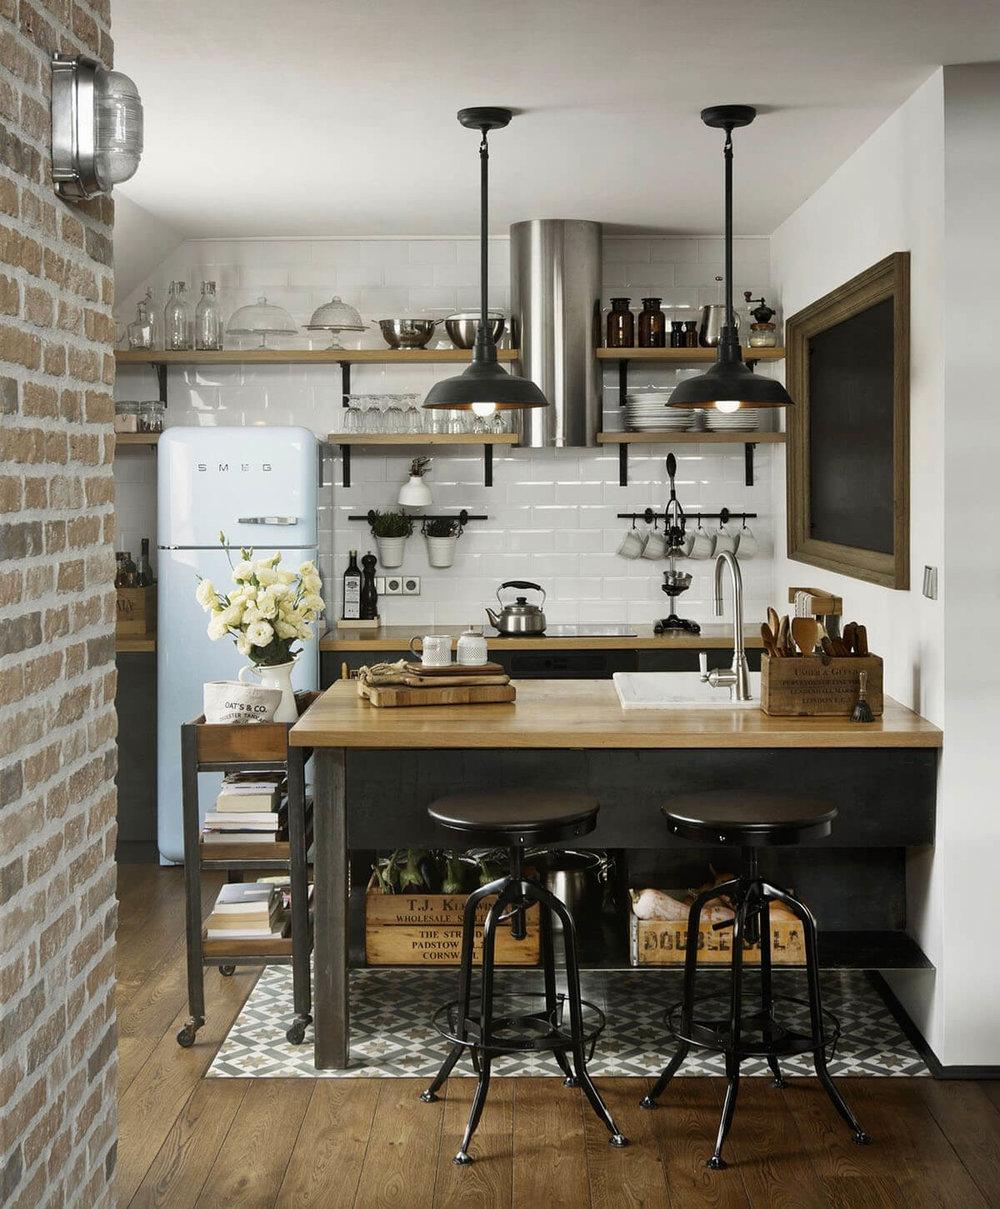 Small kitchen design ideas I www.blog.vigoindustries.com